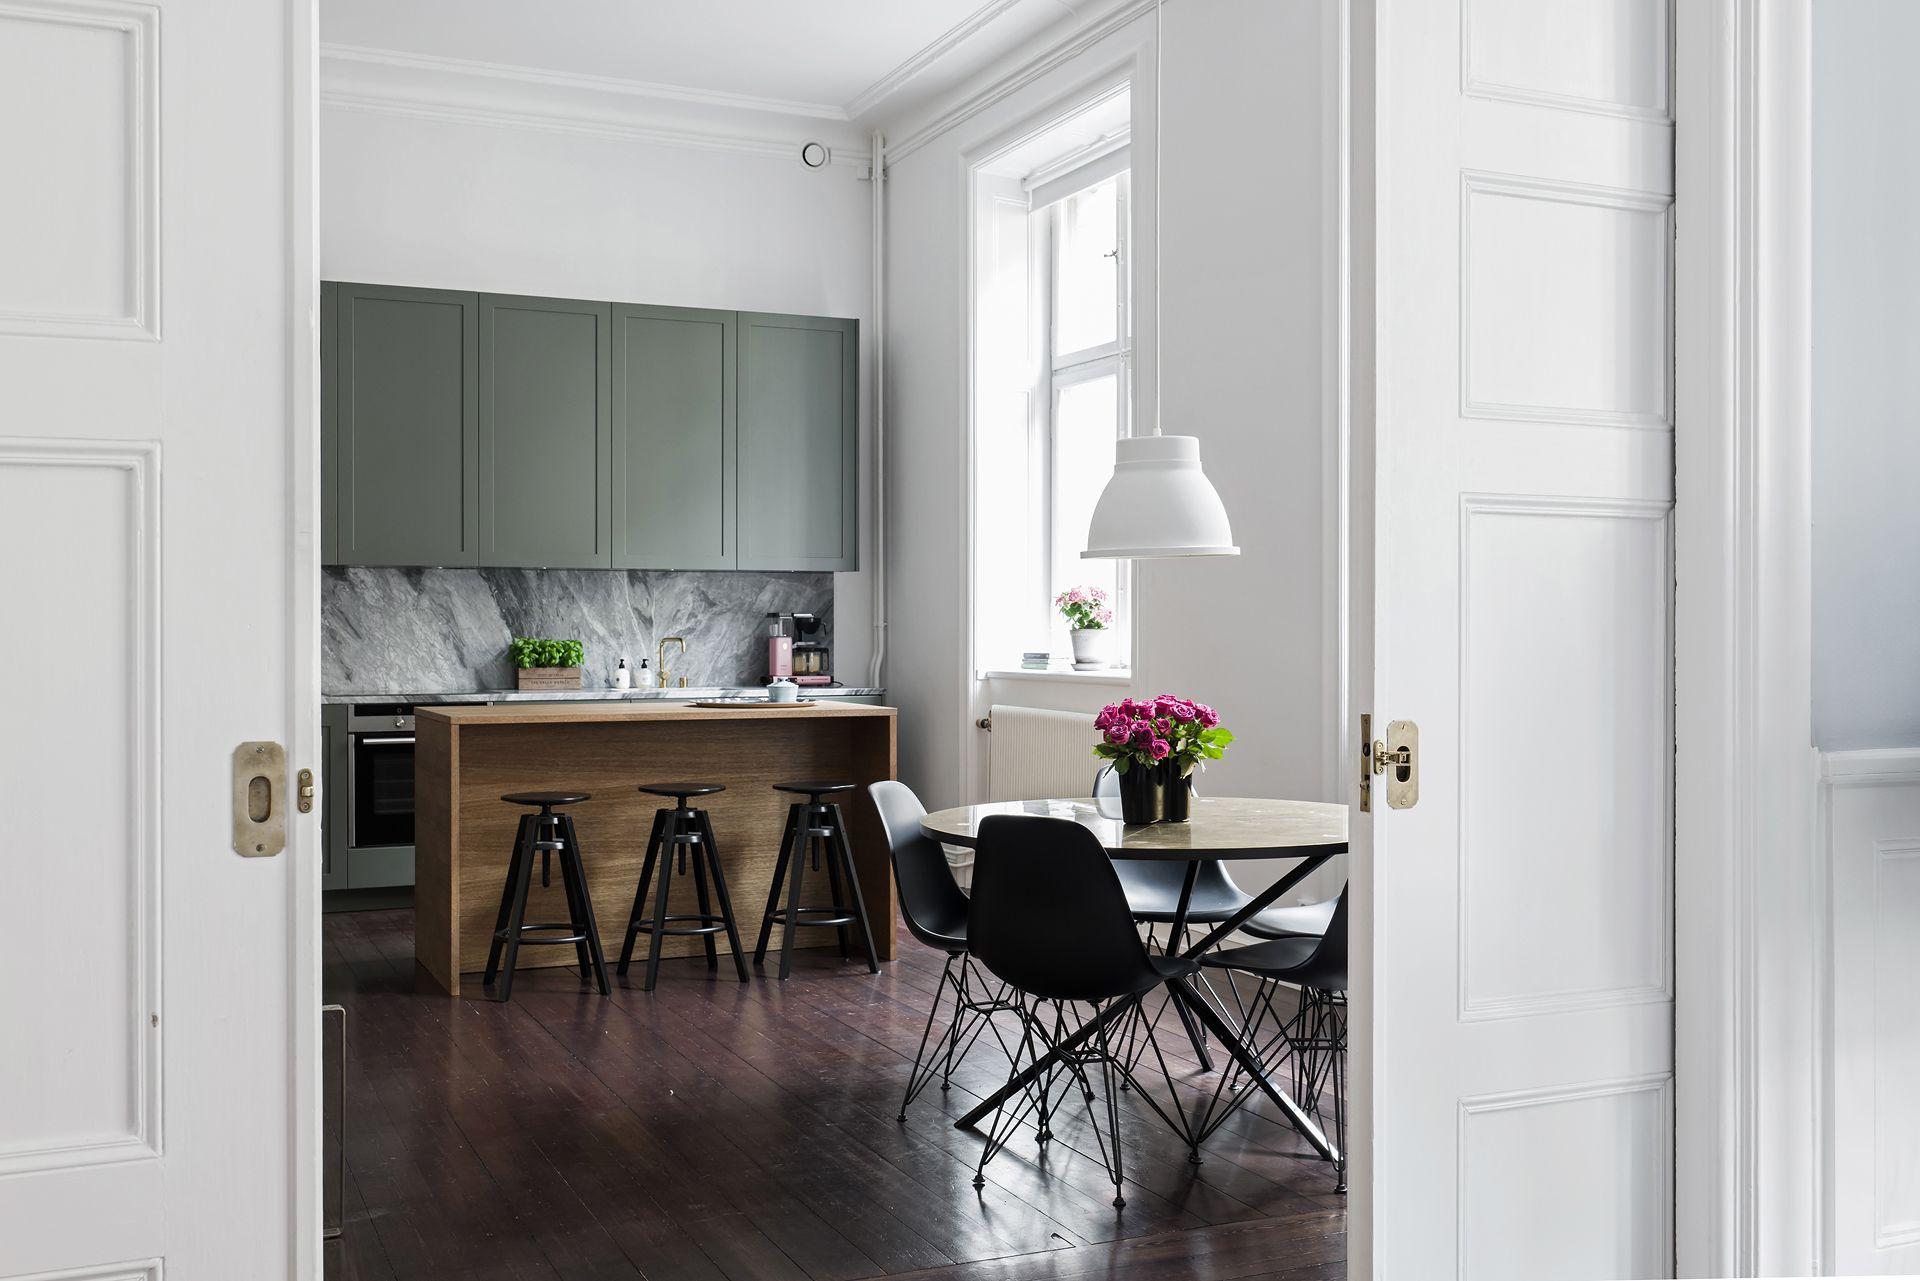 Minimal Scandinavian Kitchen Sage Green Marble Decor Green Kitchen Walls Home Decor Marble Decor